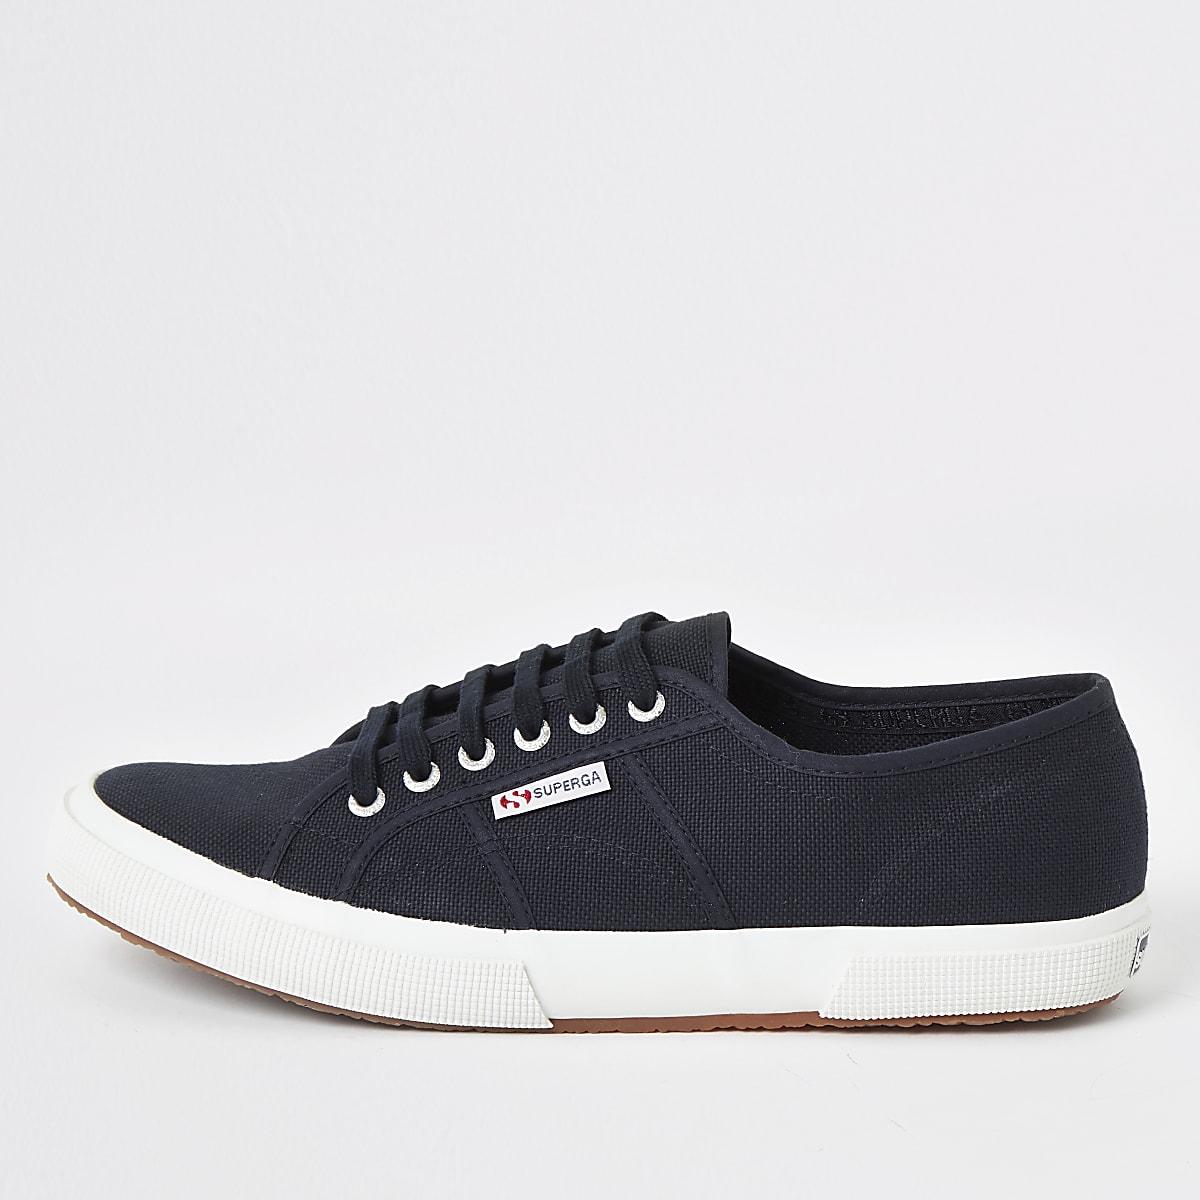 Superga navy classic runner sneakers